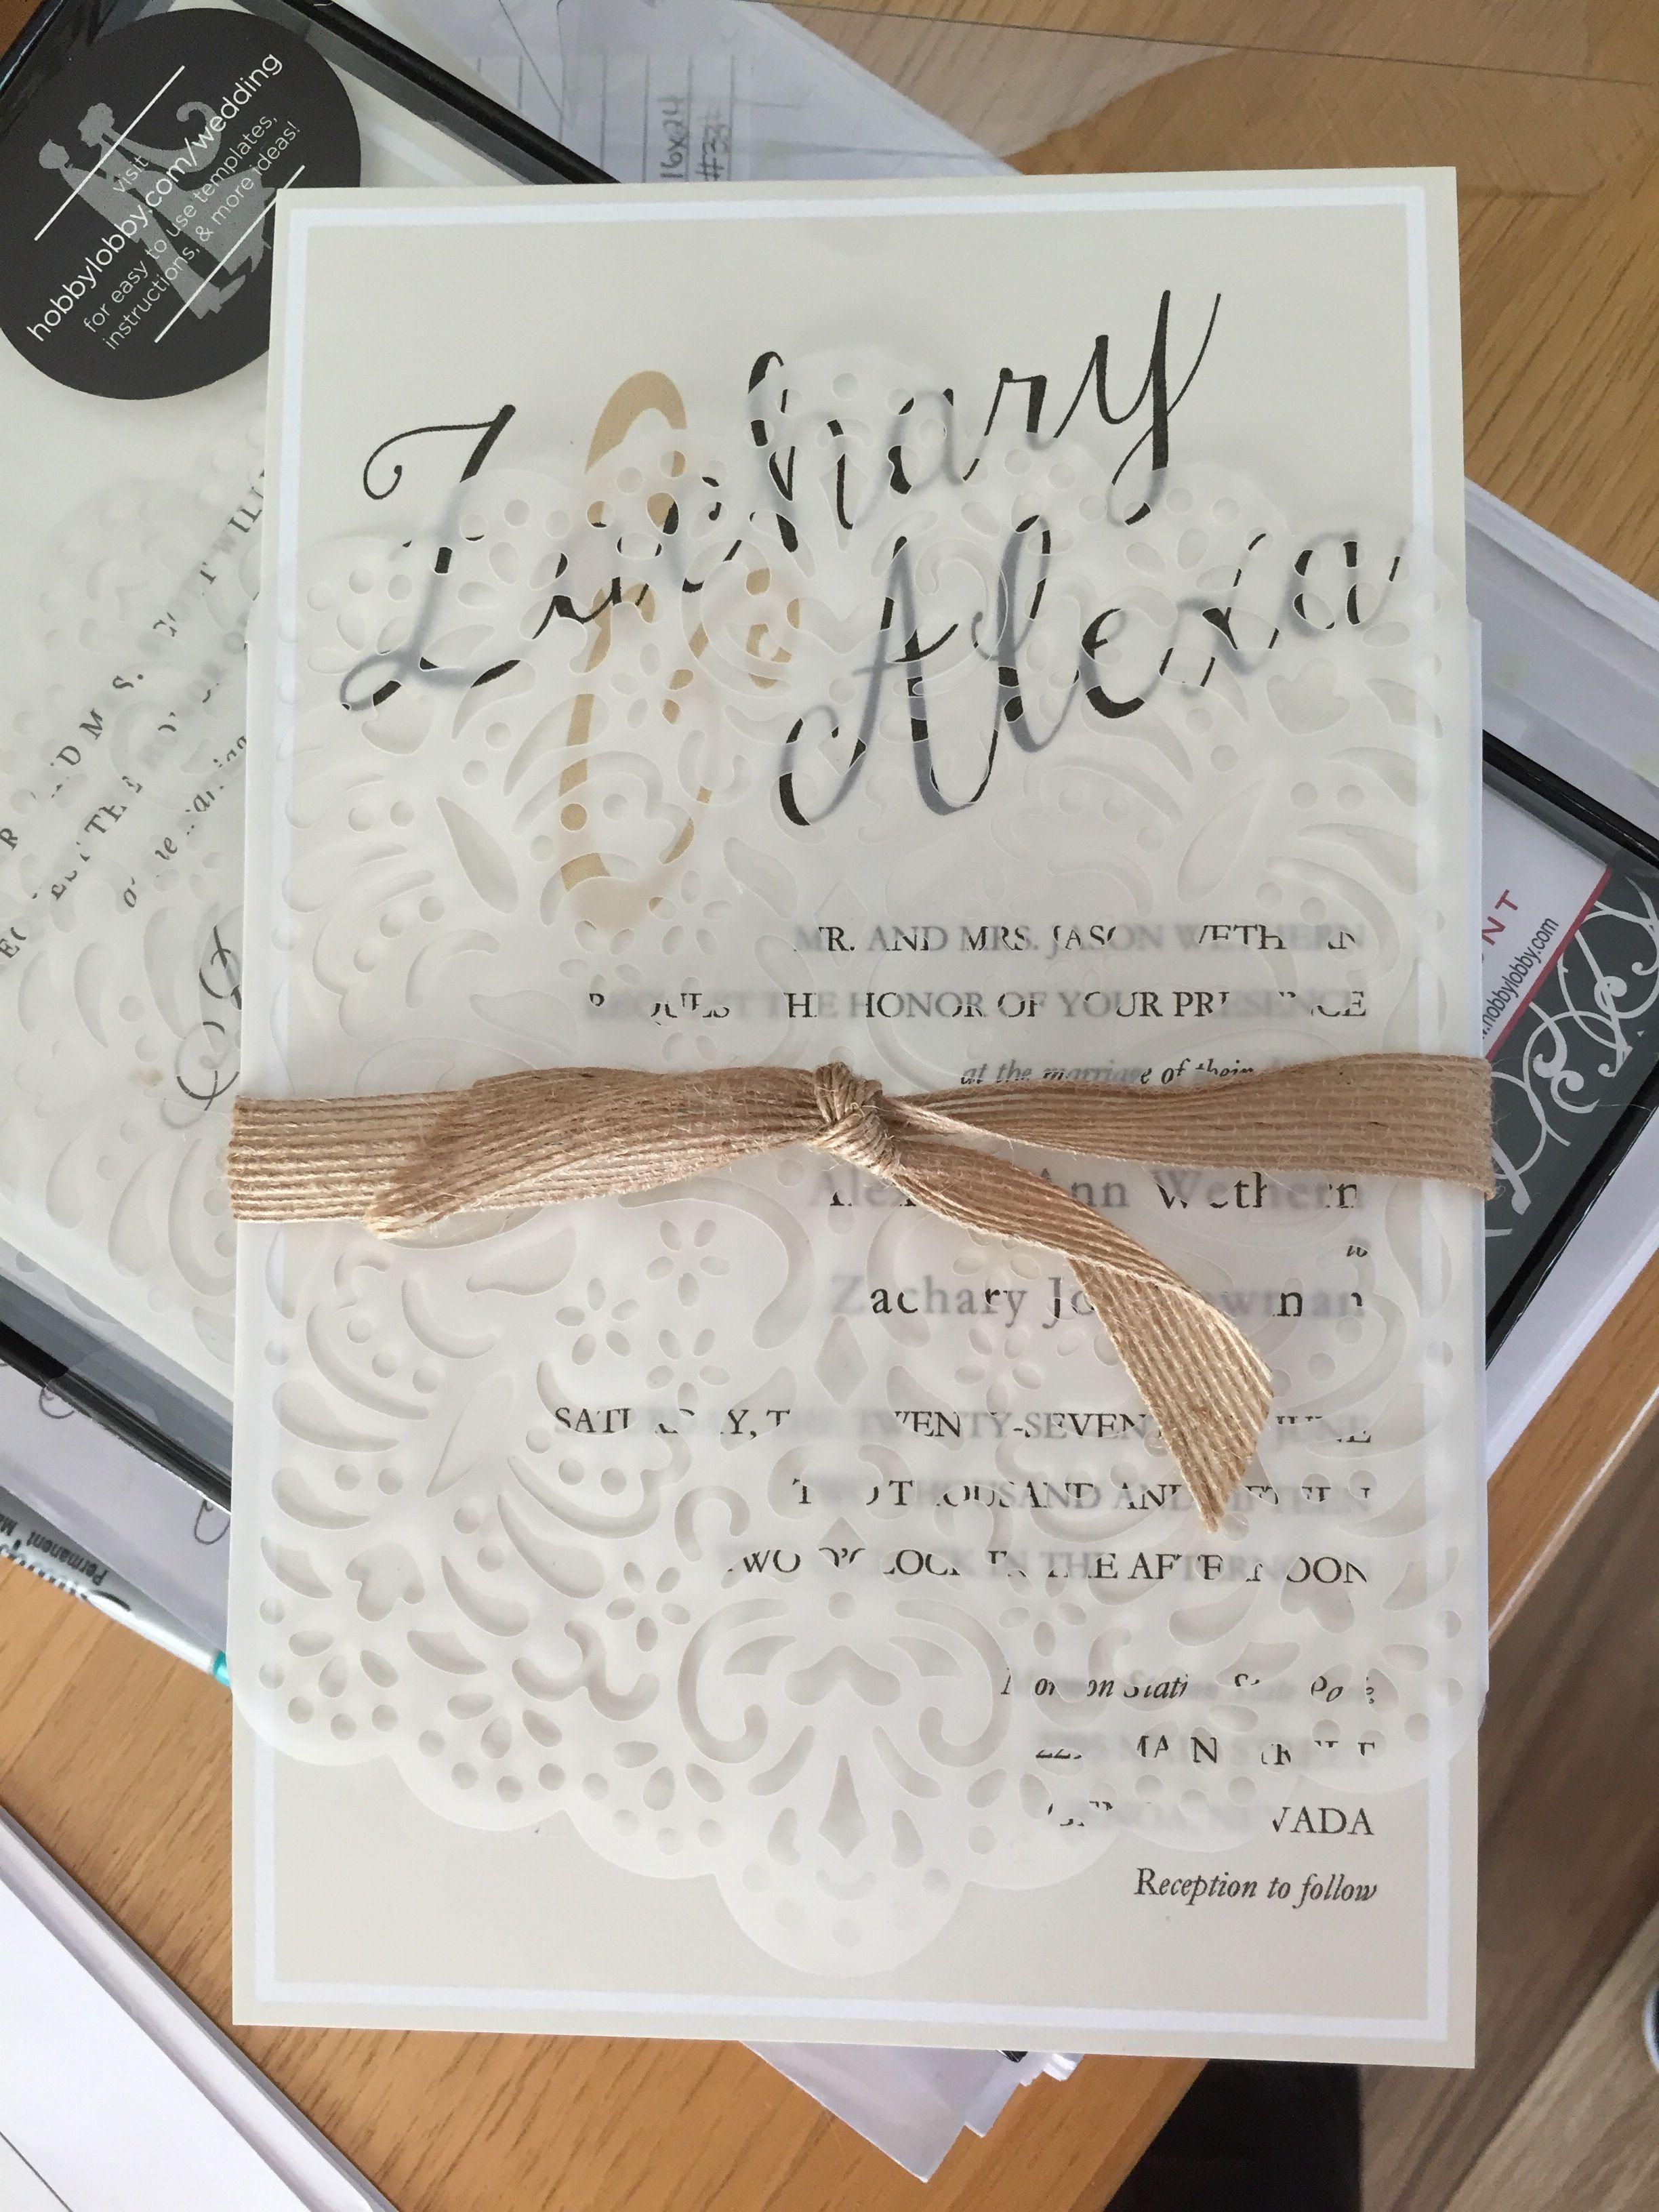 42 Hobby Lobby Invitation Template Wedding Invitation Kits Diy Wedding Invitation Kits Fun Wedding Invitations Hobby lobby wedding invitations template